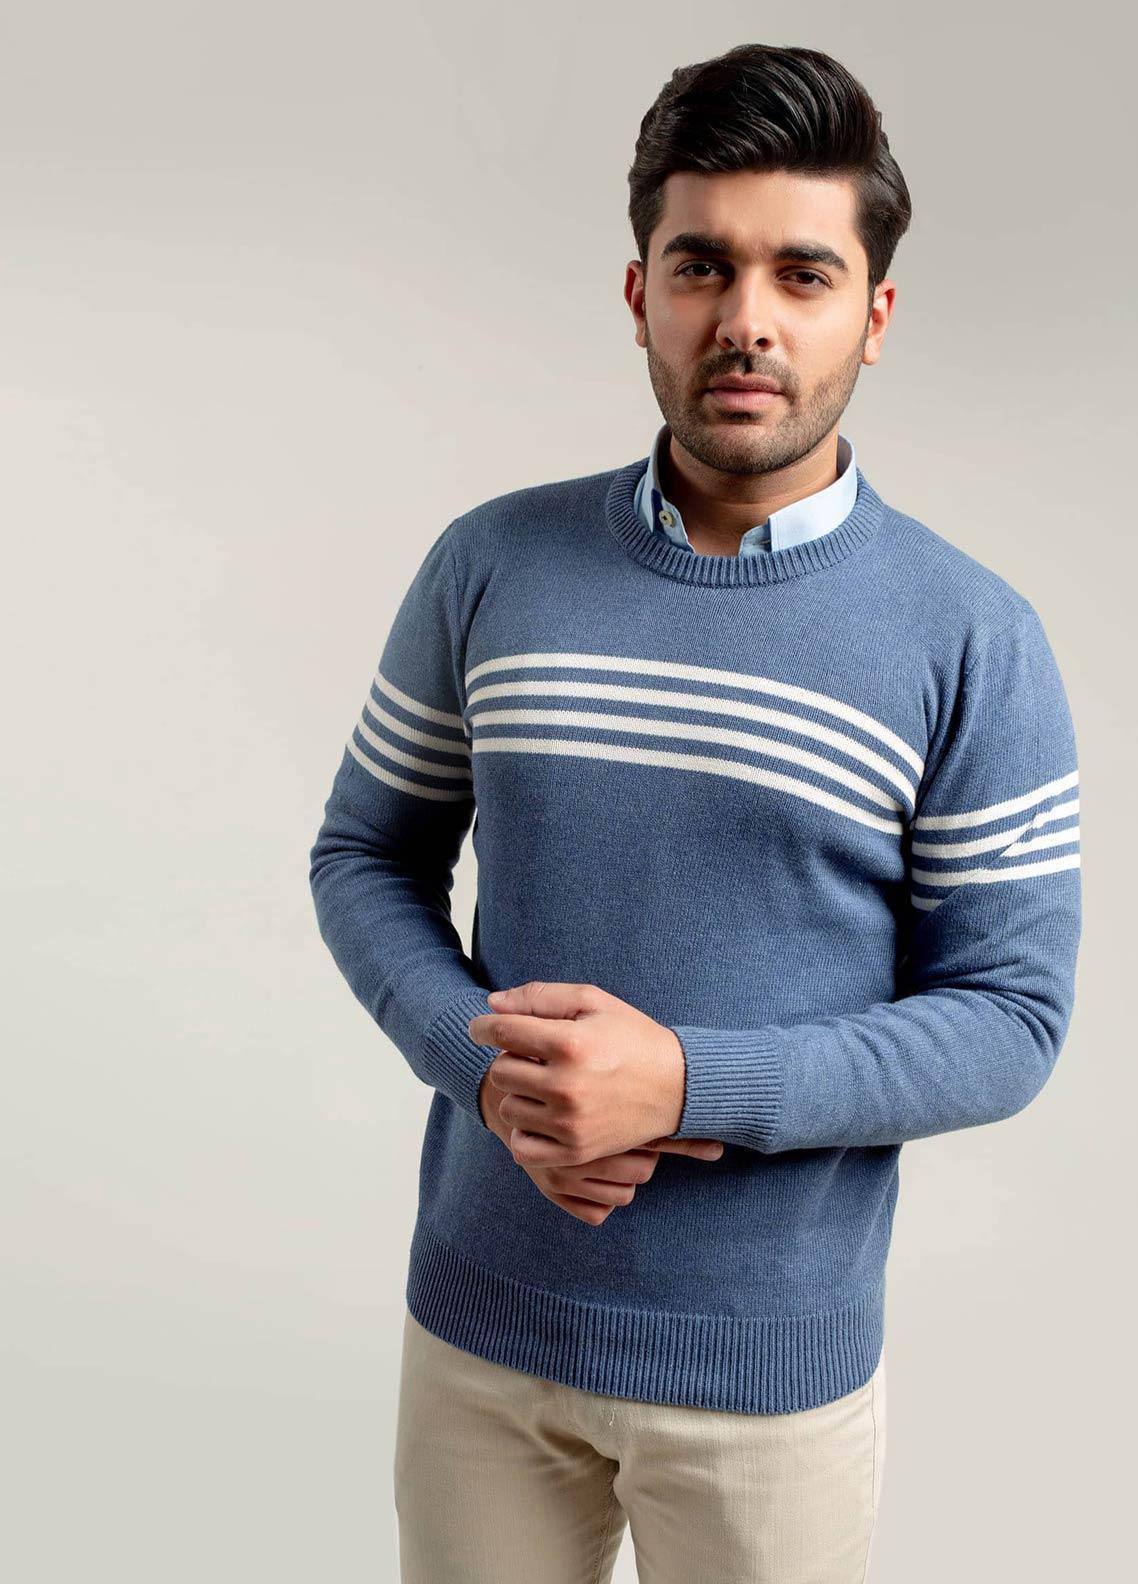 Brumano Cotton Full Sleeves Sweaters for Men -  BM20WS Blue & White Striped Crew Neck Jumper